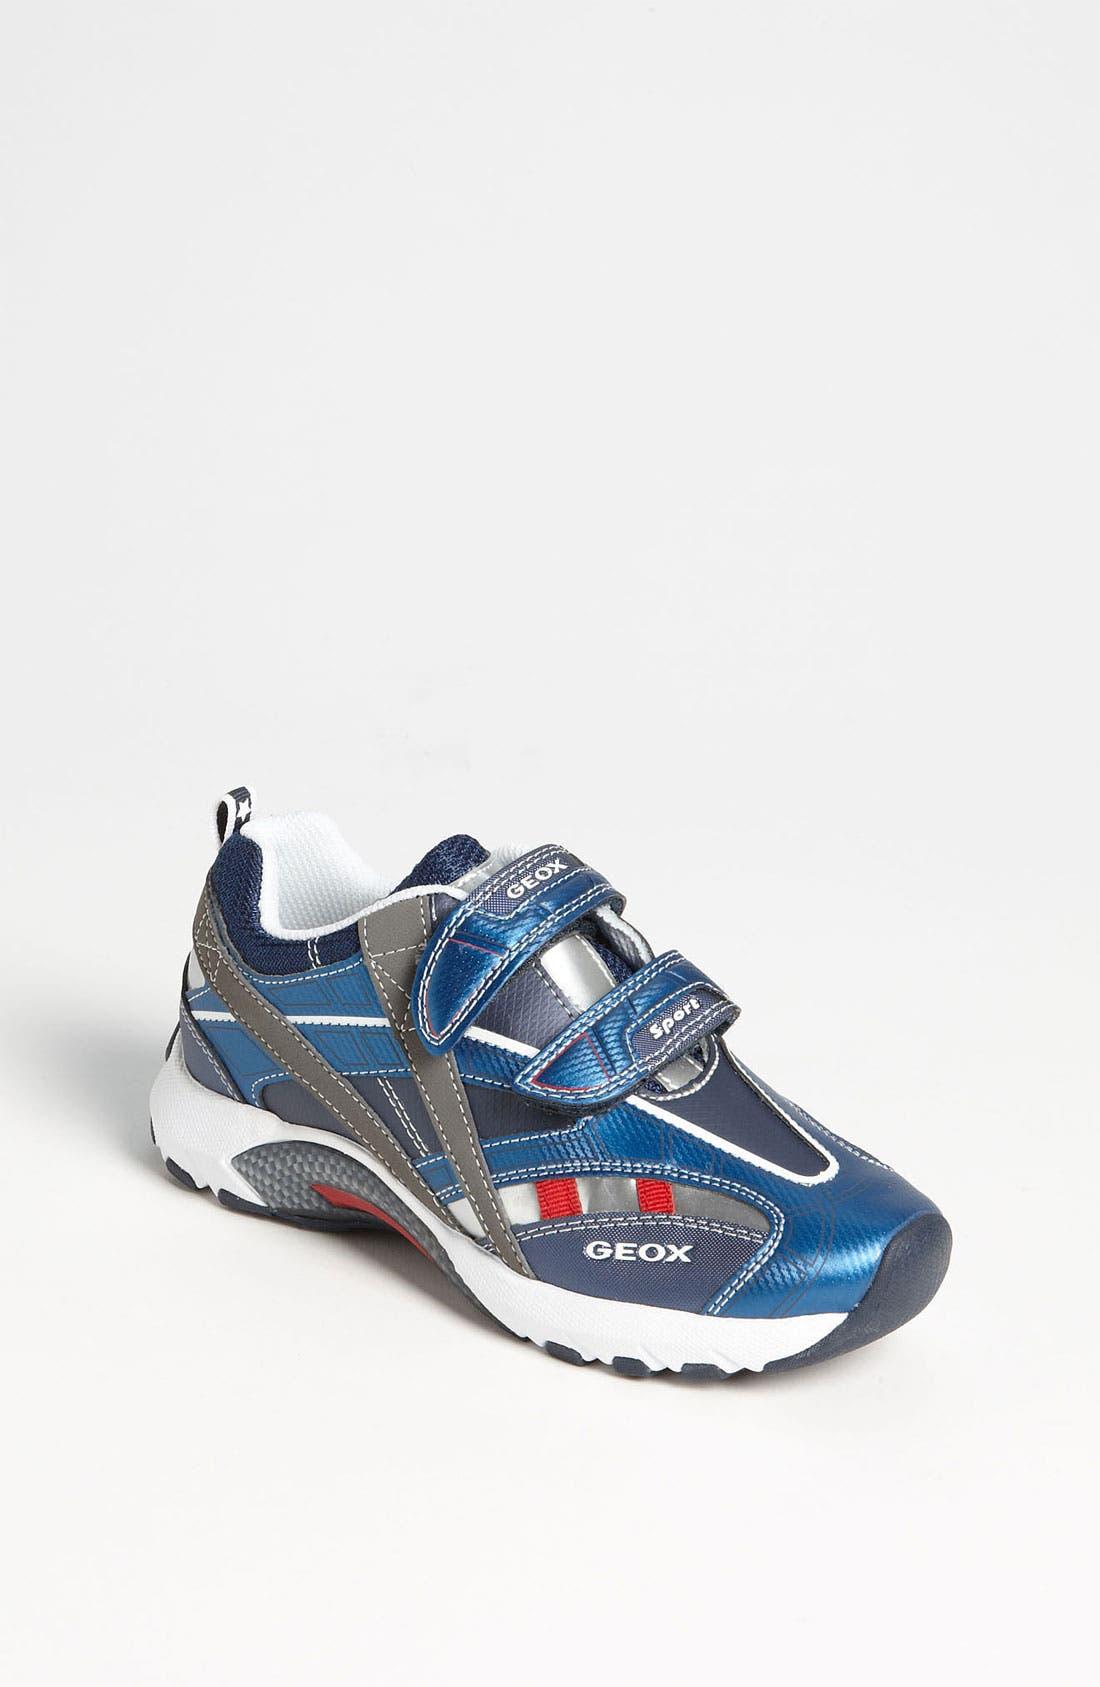 Alternate Image 1 Selected - Geox 'Stark' Sneaker (Toddler, Little Kid & Big Kid)